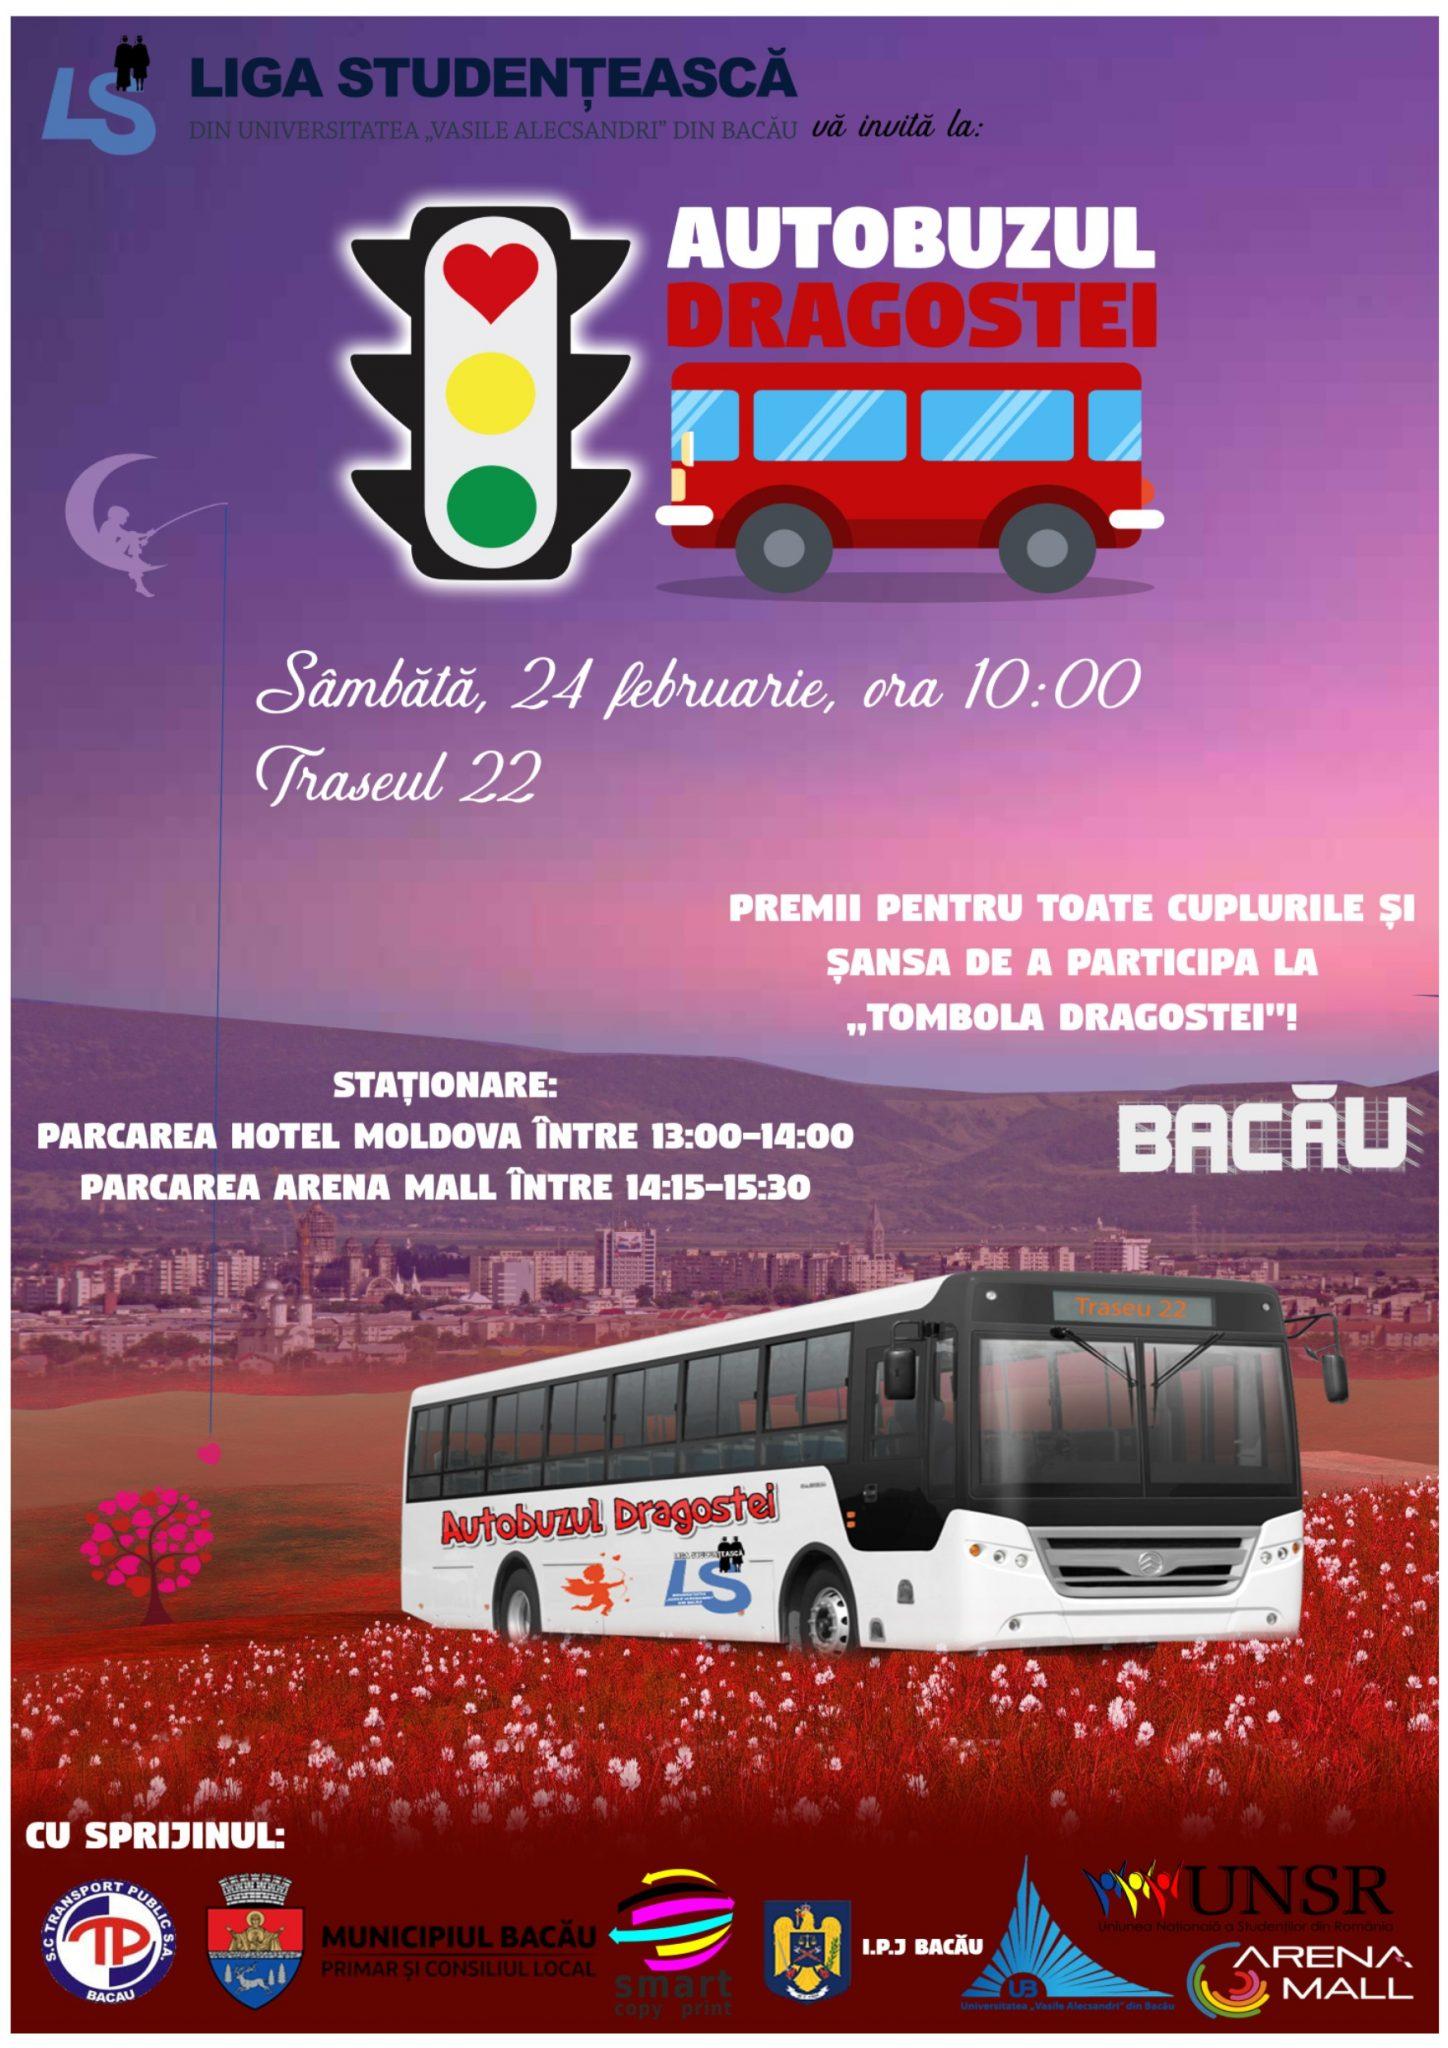 Autobuzul-Dragostei-Liga-Studenteasca-bacau-Universitatea-Vasile-Alecsandri-24-februarie-Ziua-indragostitilor-evenimente-dragobere-februarie-2018-Arena-Mall